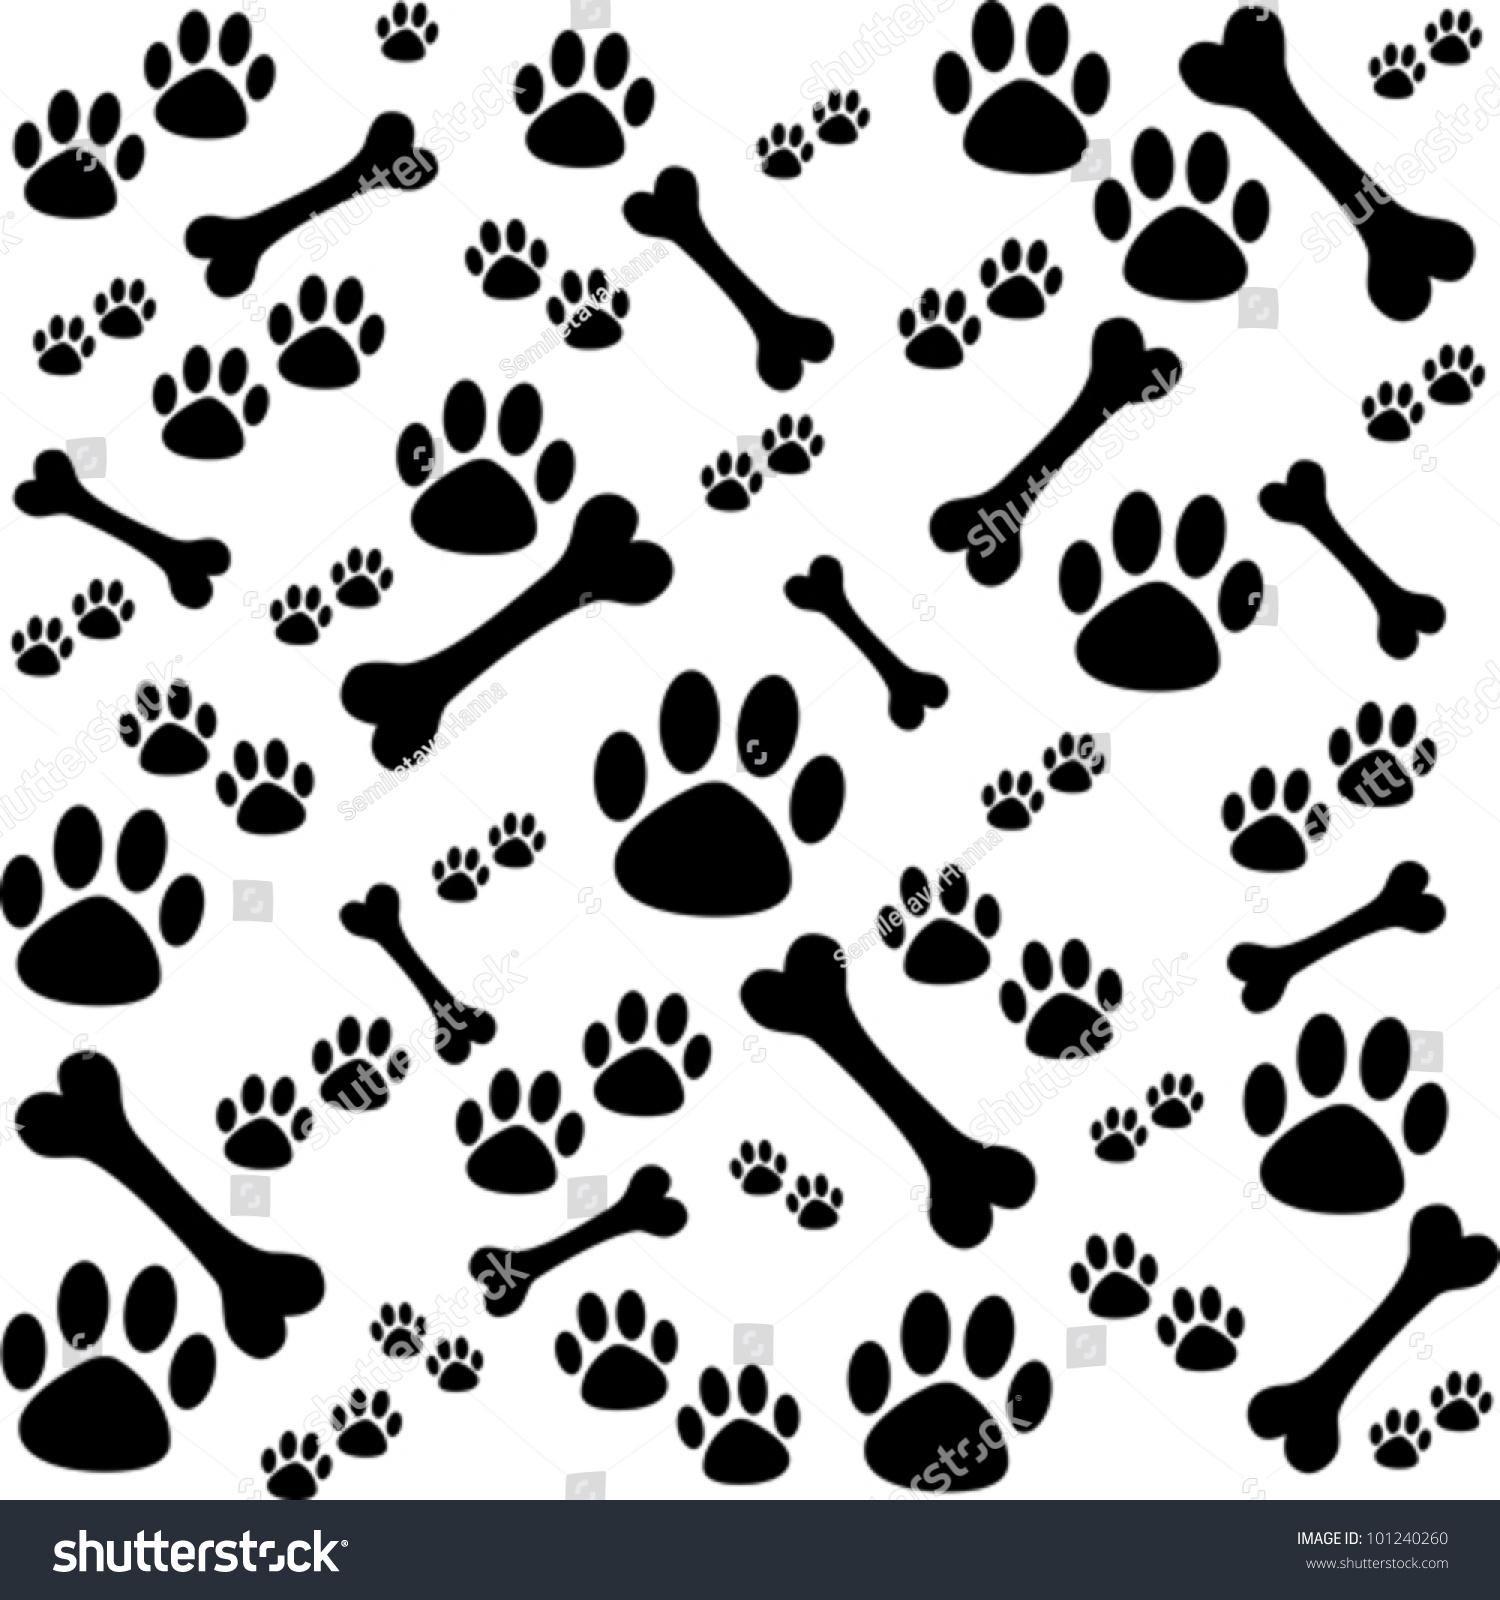 paw print bones wallpaper - photo #14